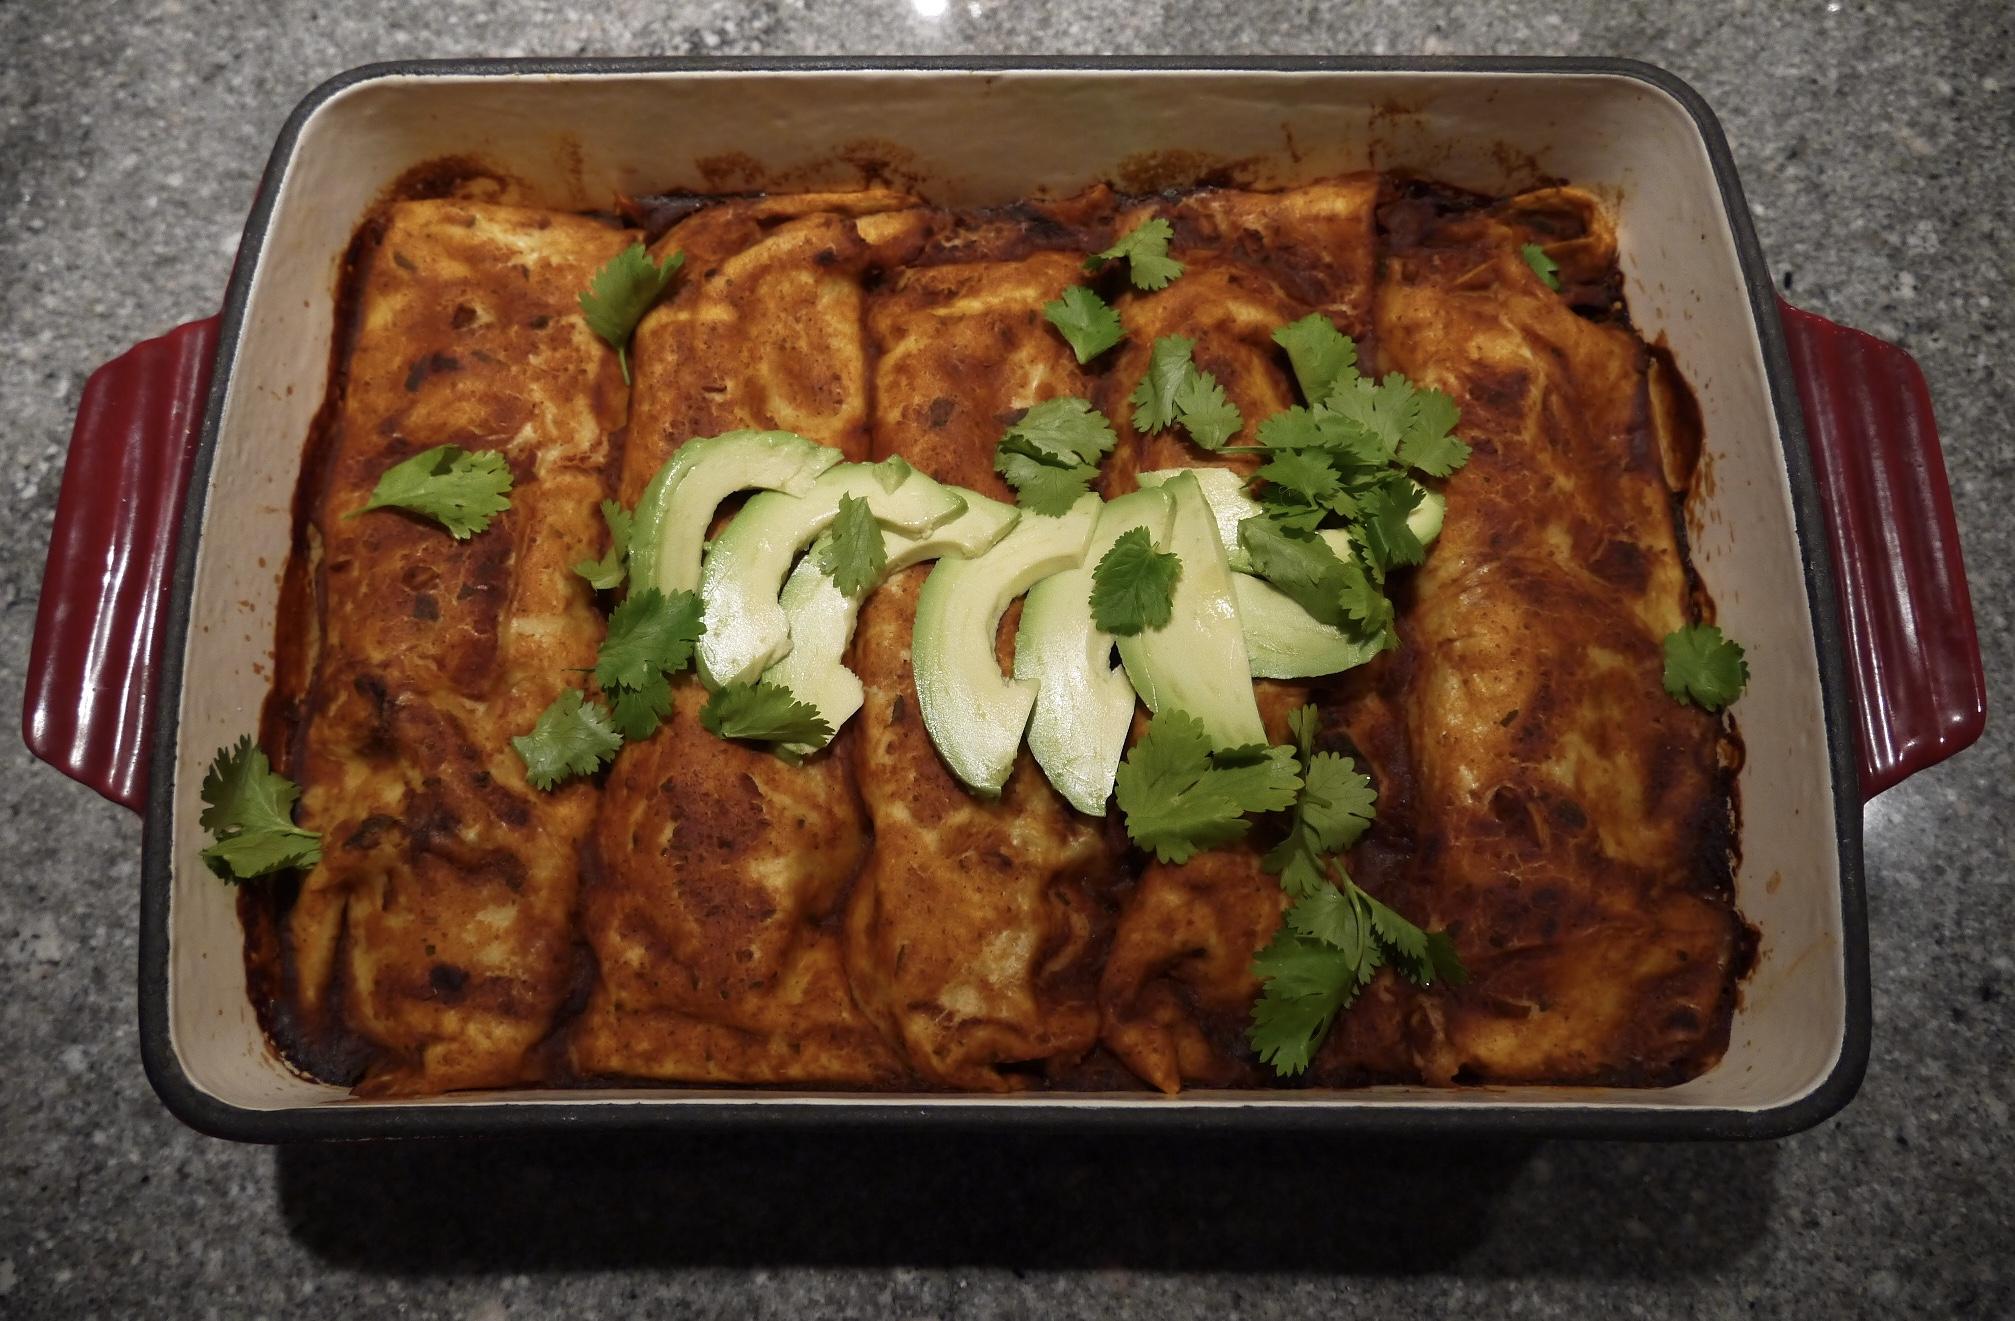 thug kitchen enchiladas - trustinkim